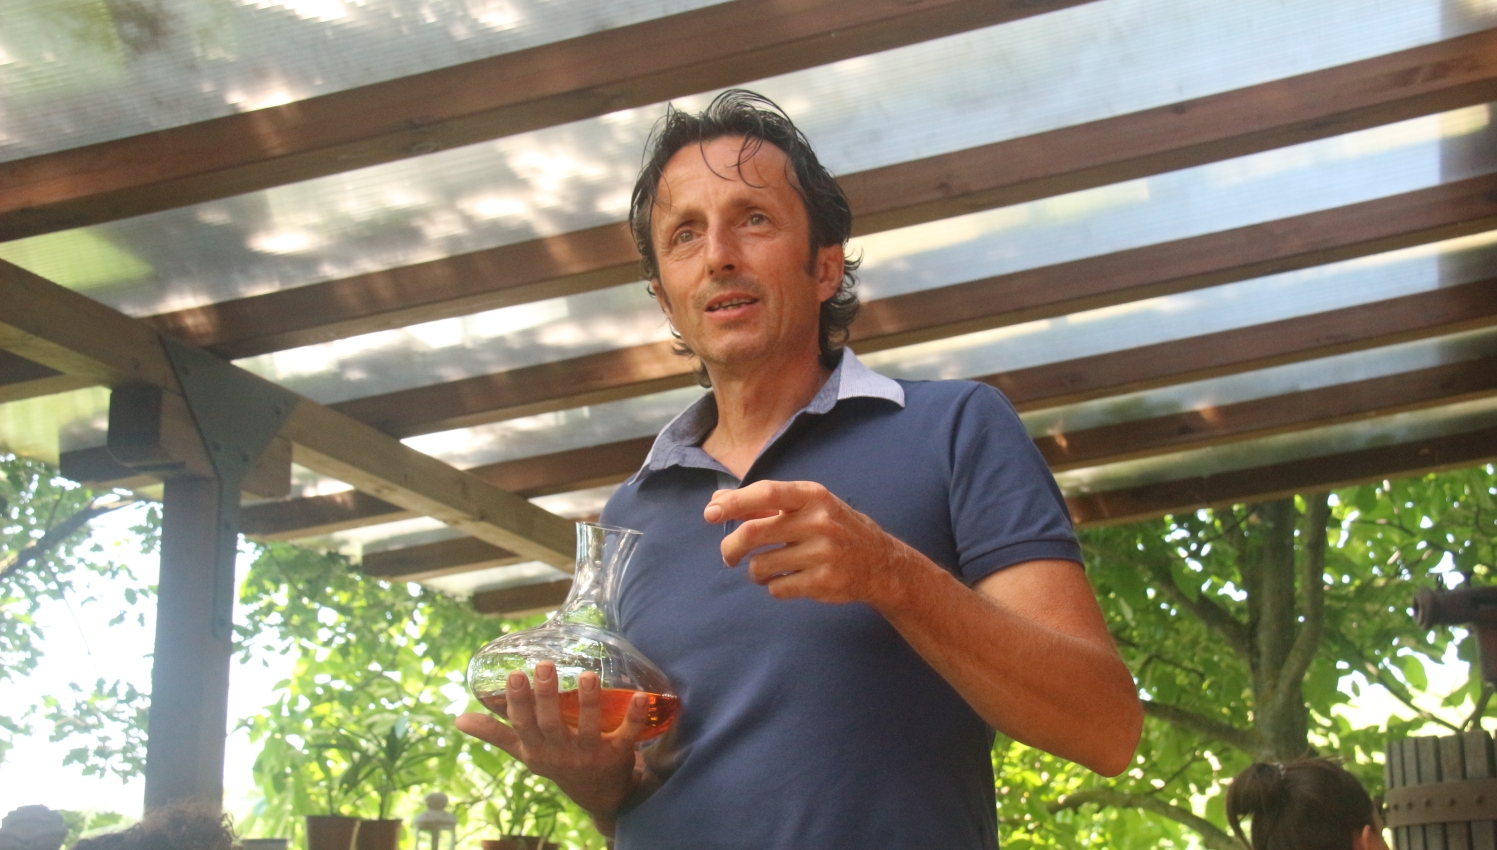 Carlo Daniele Ricci